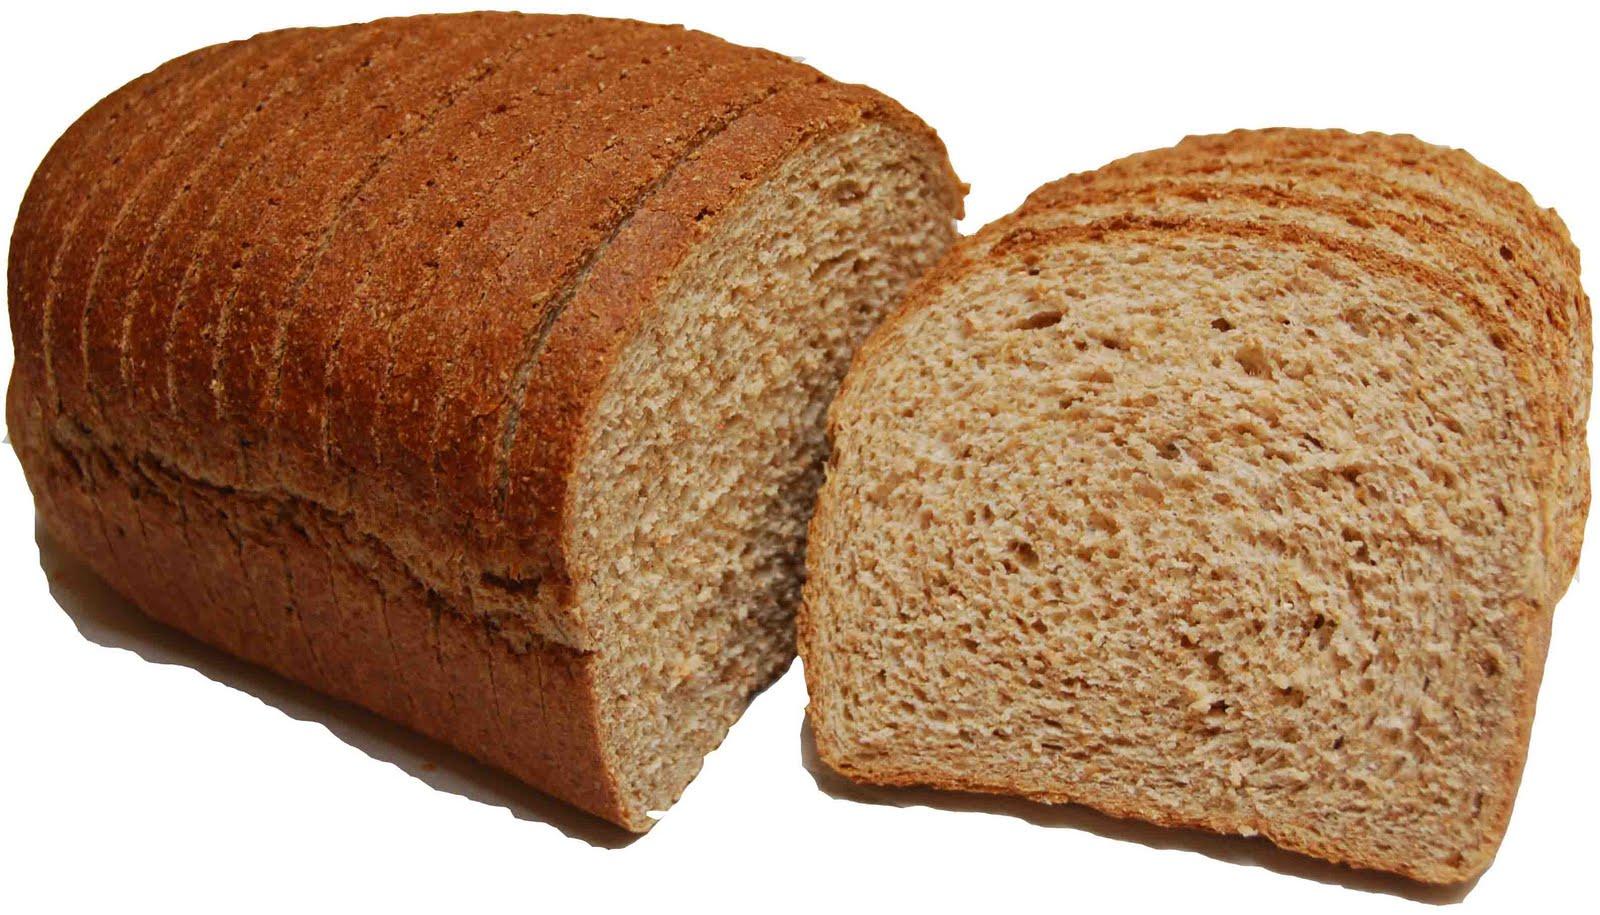 brood-gluten-je-eigen-coach-gezond.jpg